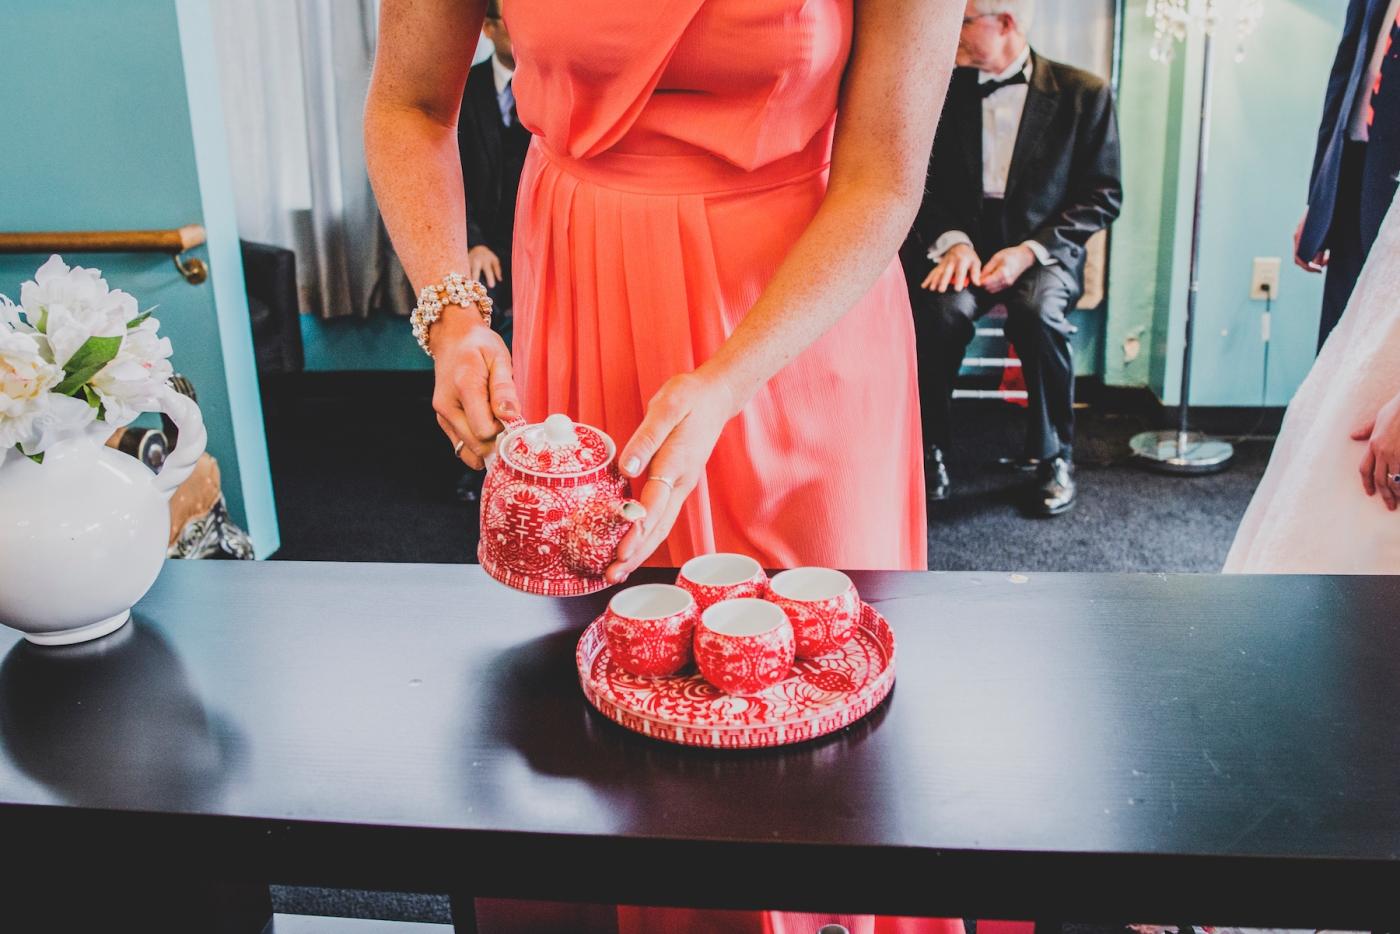 DSC_2950Everett_Wedding_Ballroom_Jane_Speleers_photography_Rachel_and_Edmund_teaceremony_2017